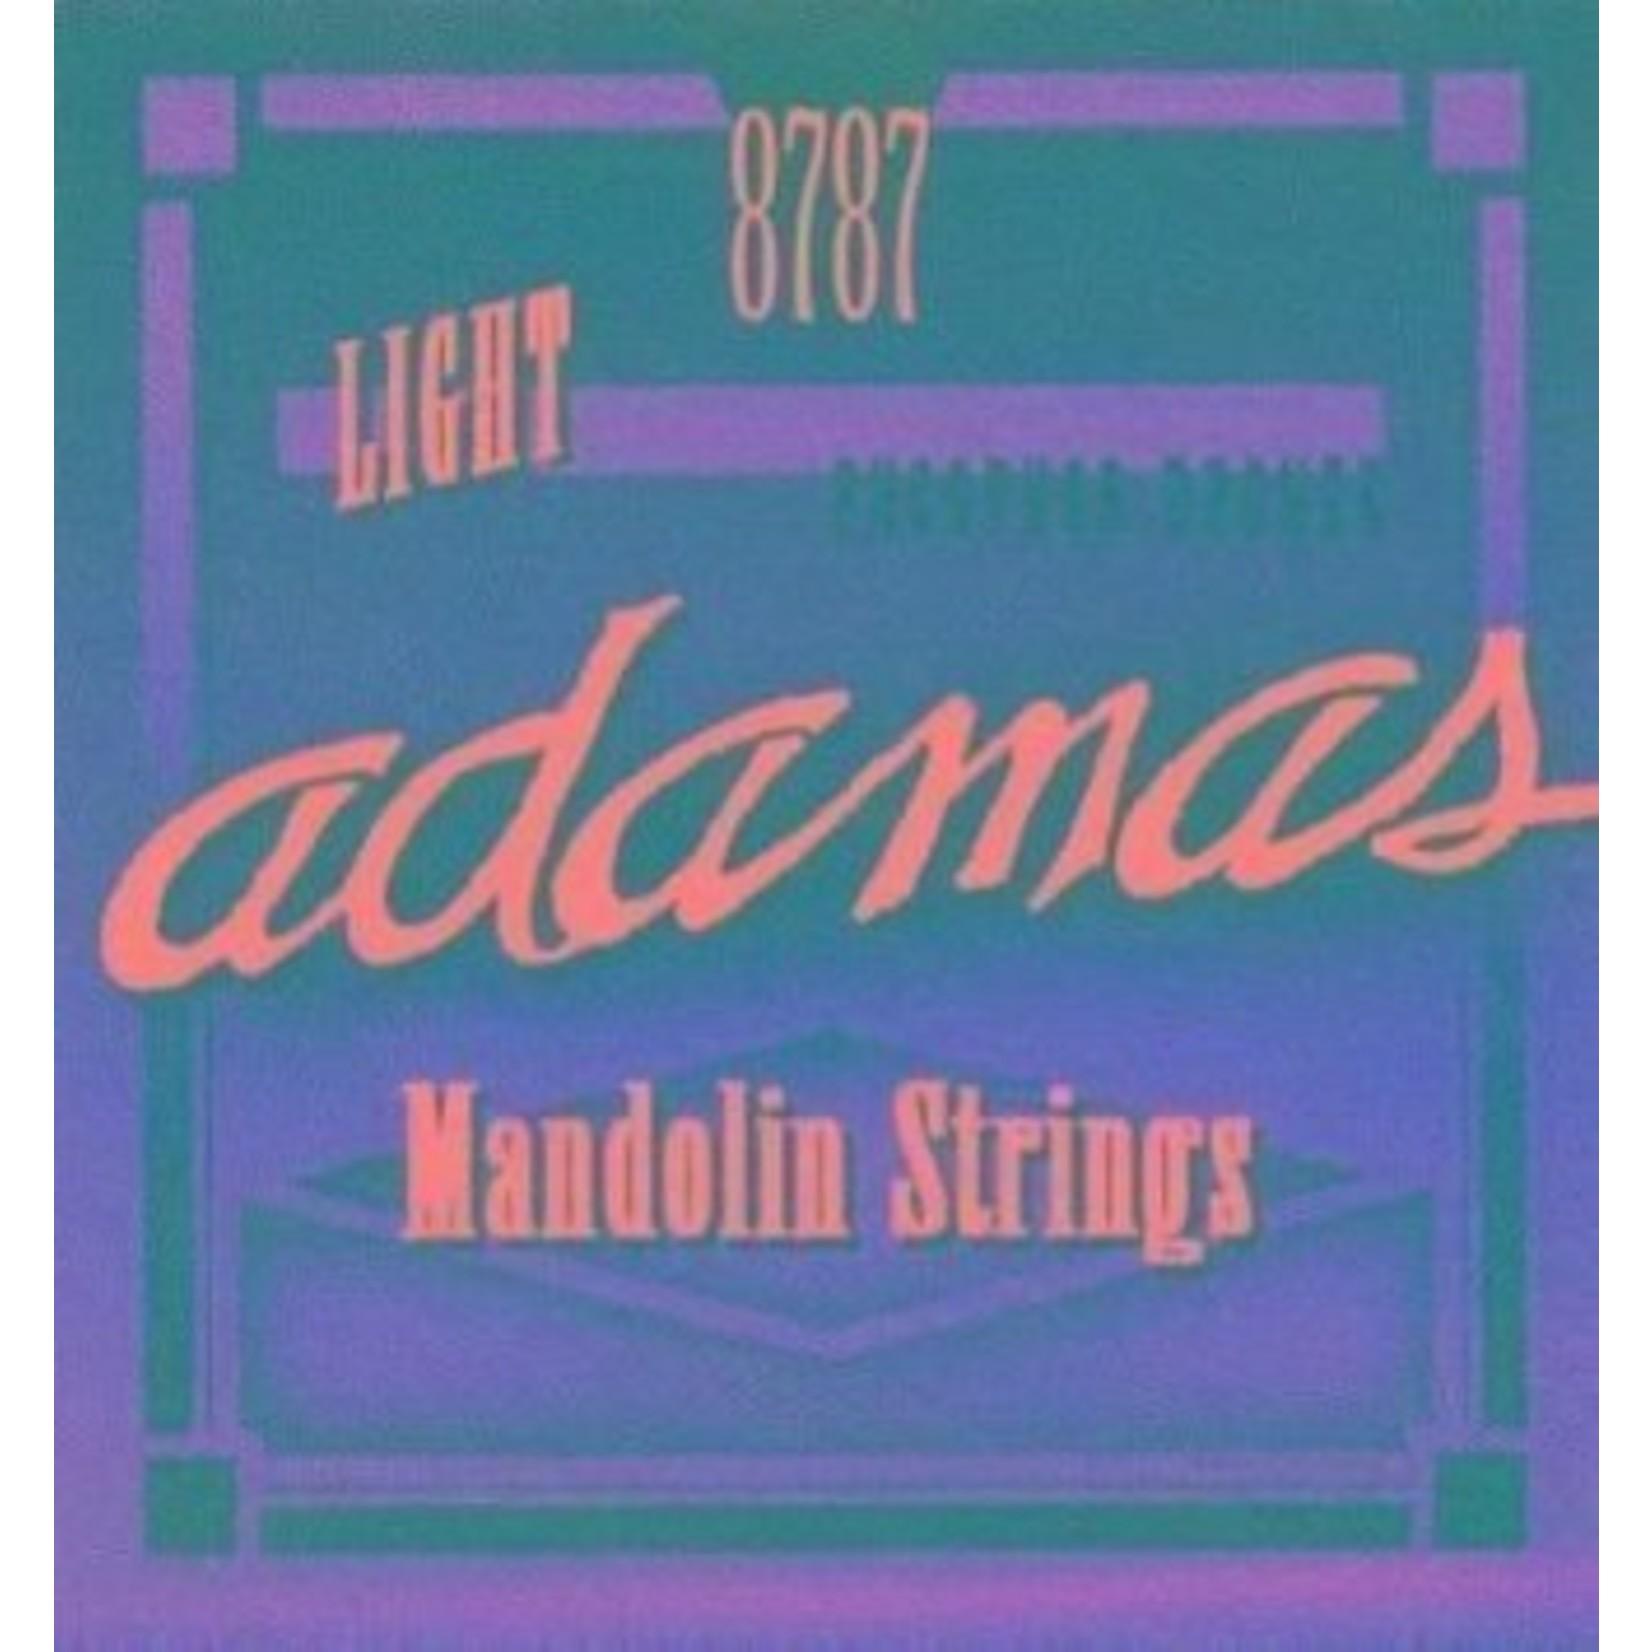 8787 MANDOLINE ADAMAS